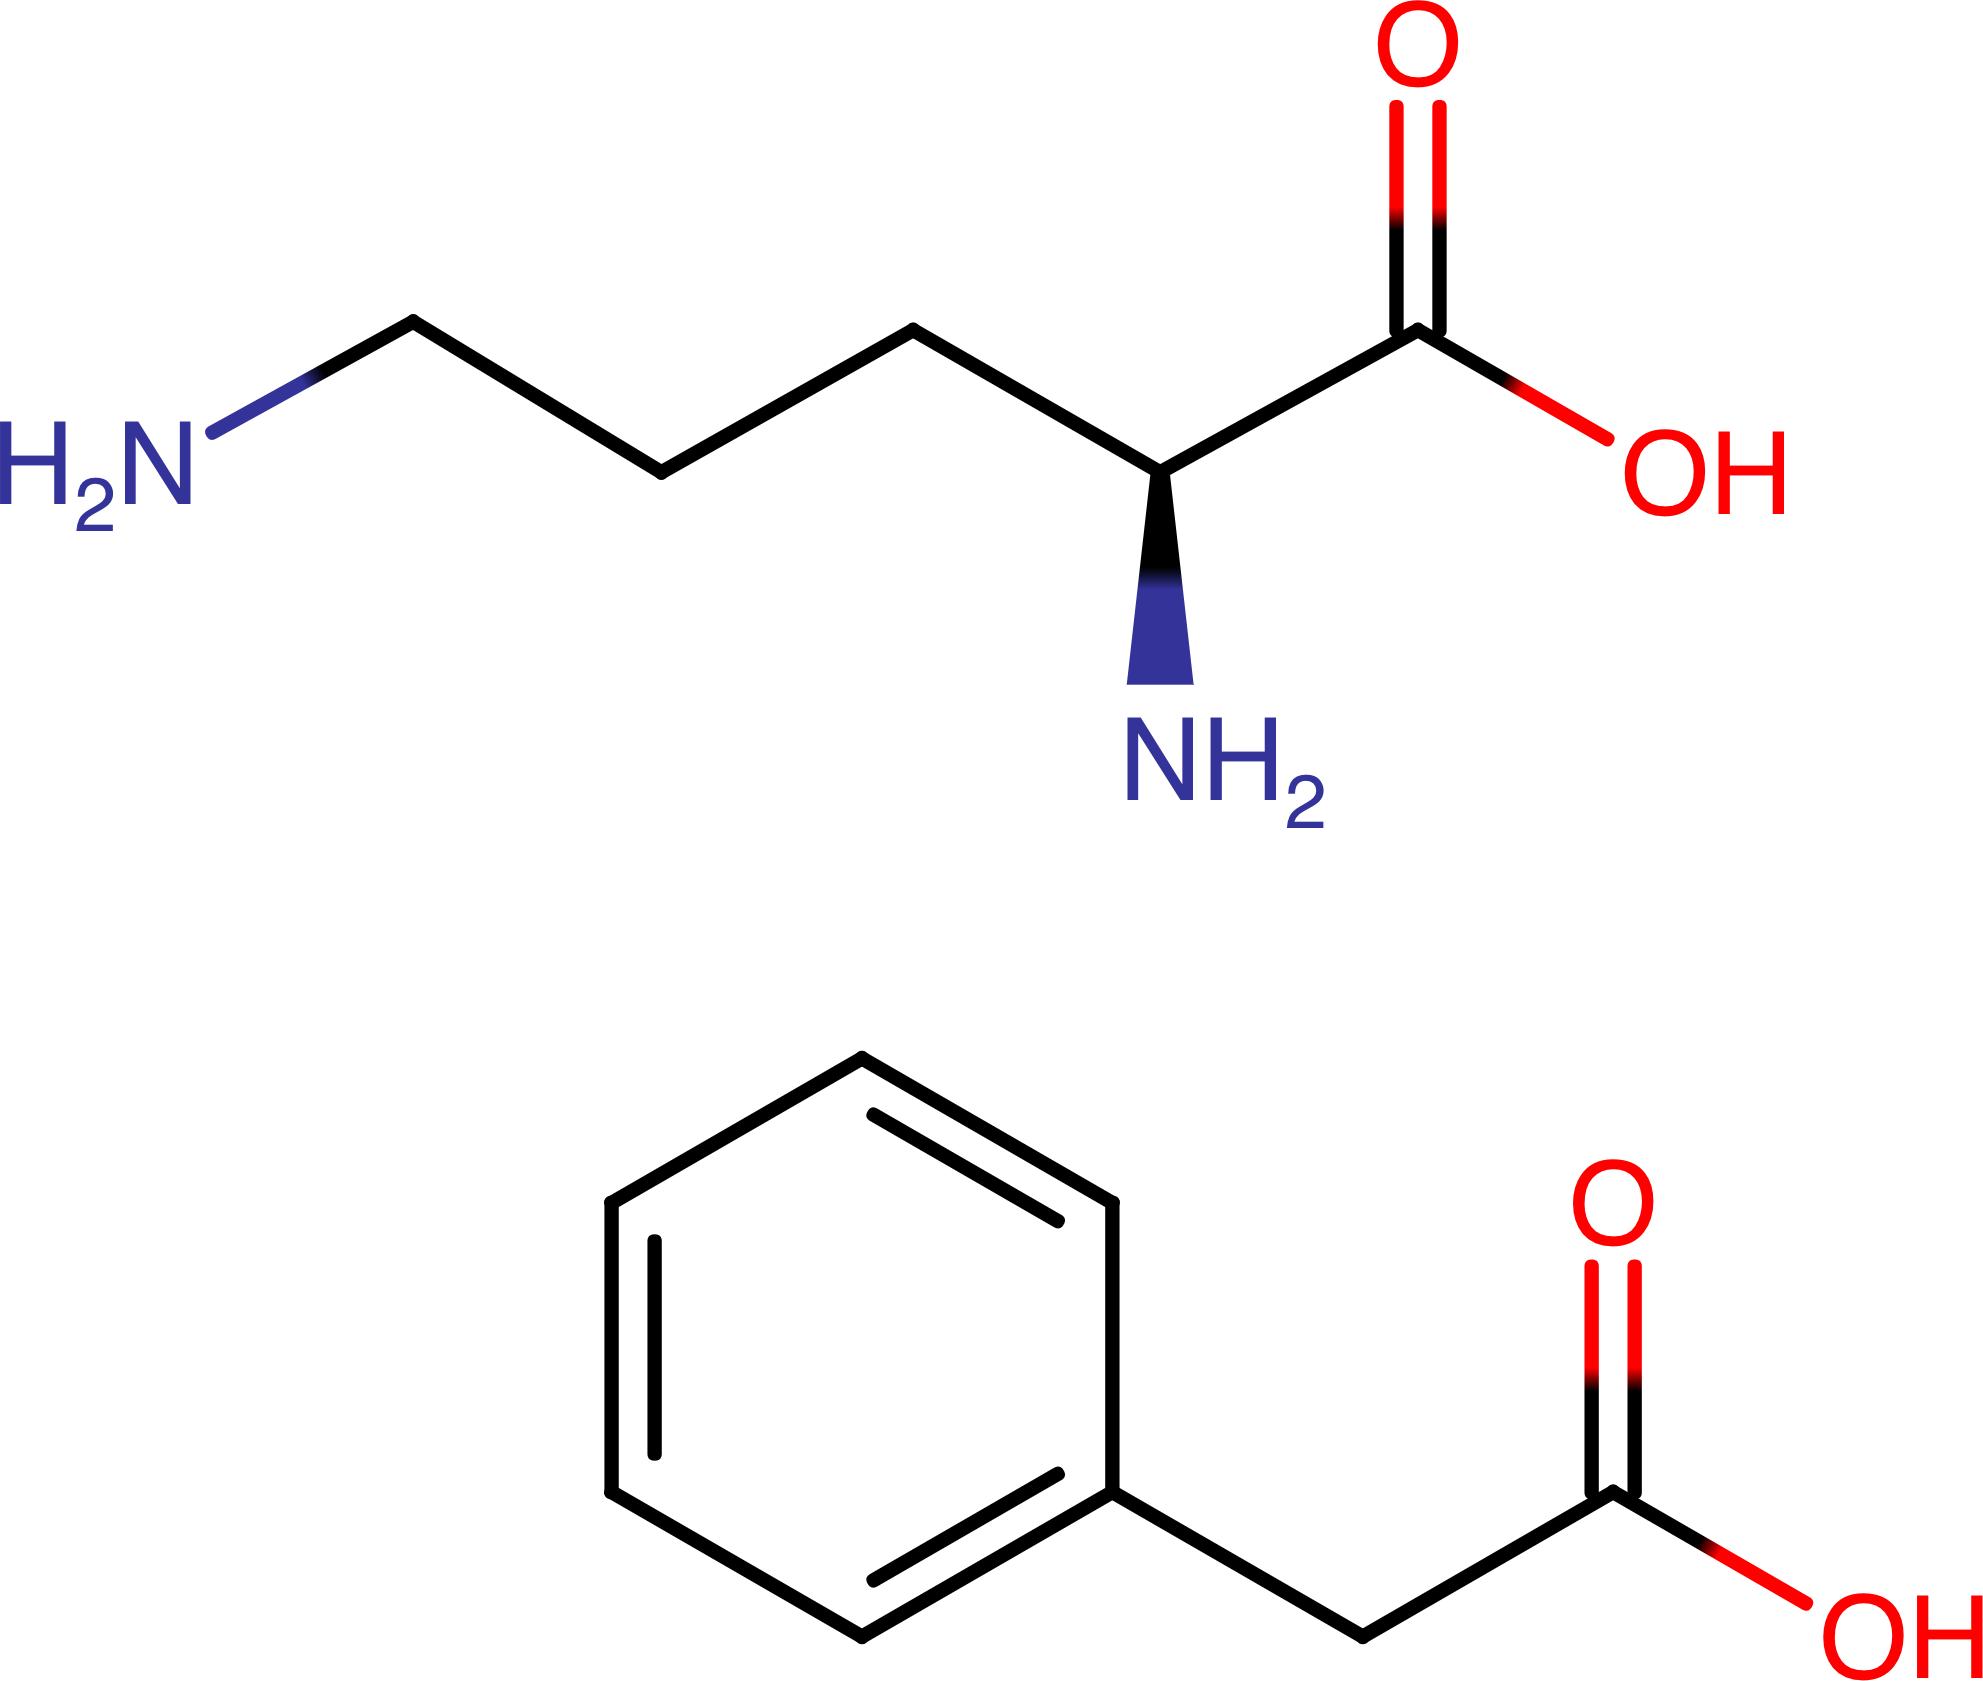 Орнитина фенилацетат (ornithine phenylacetate).